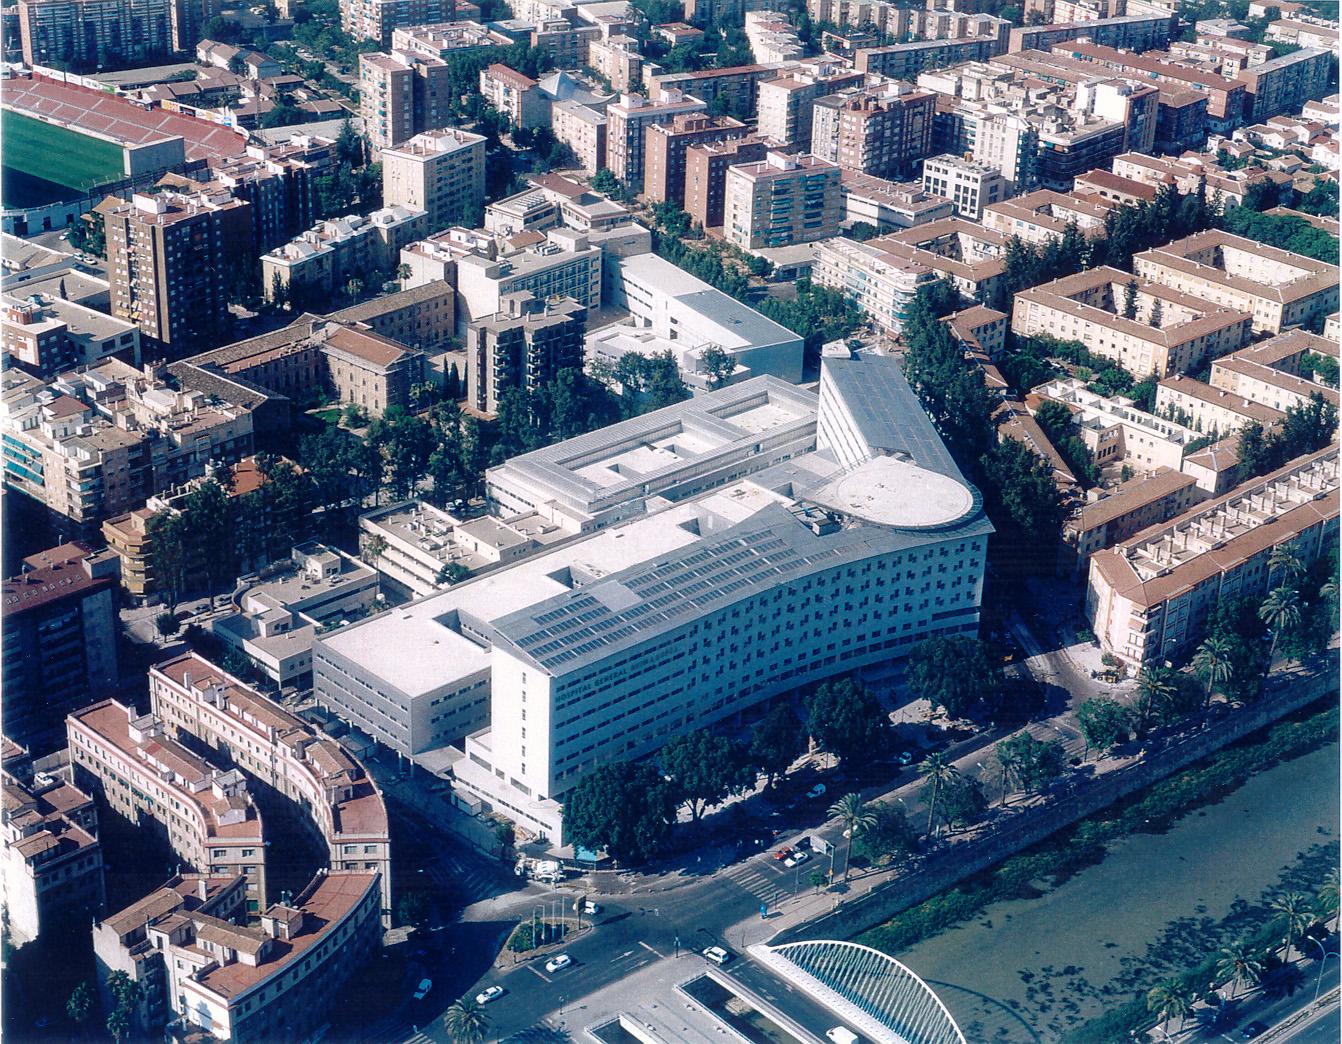 Hospital Universitario Reina Sofía de Murcia